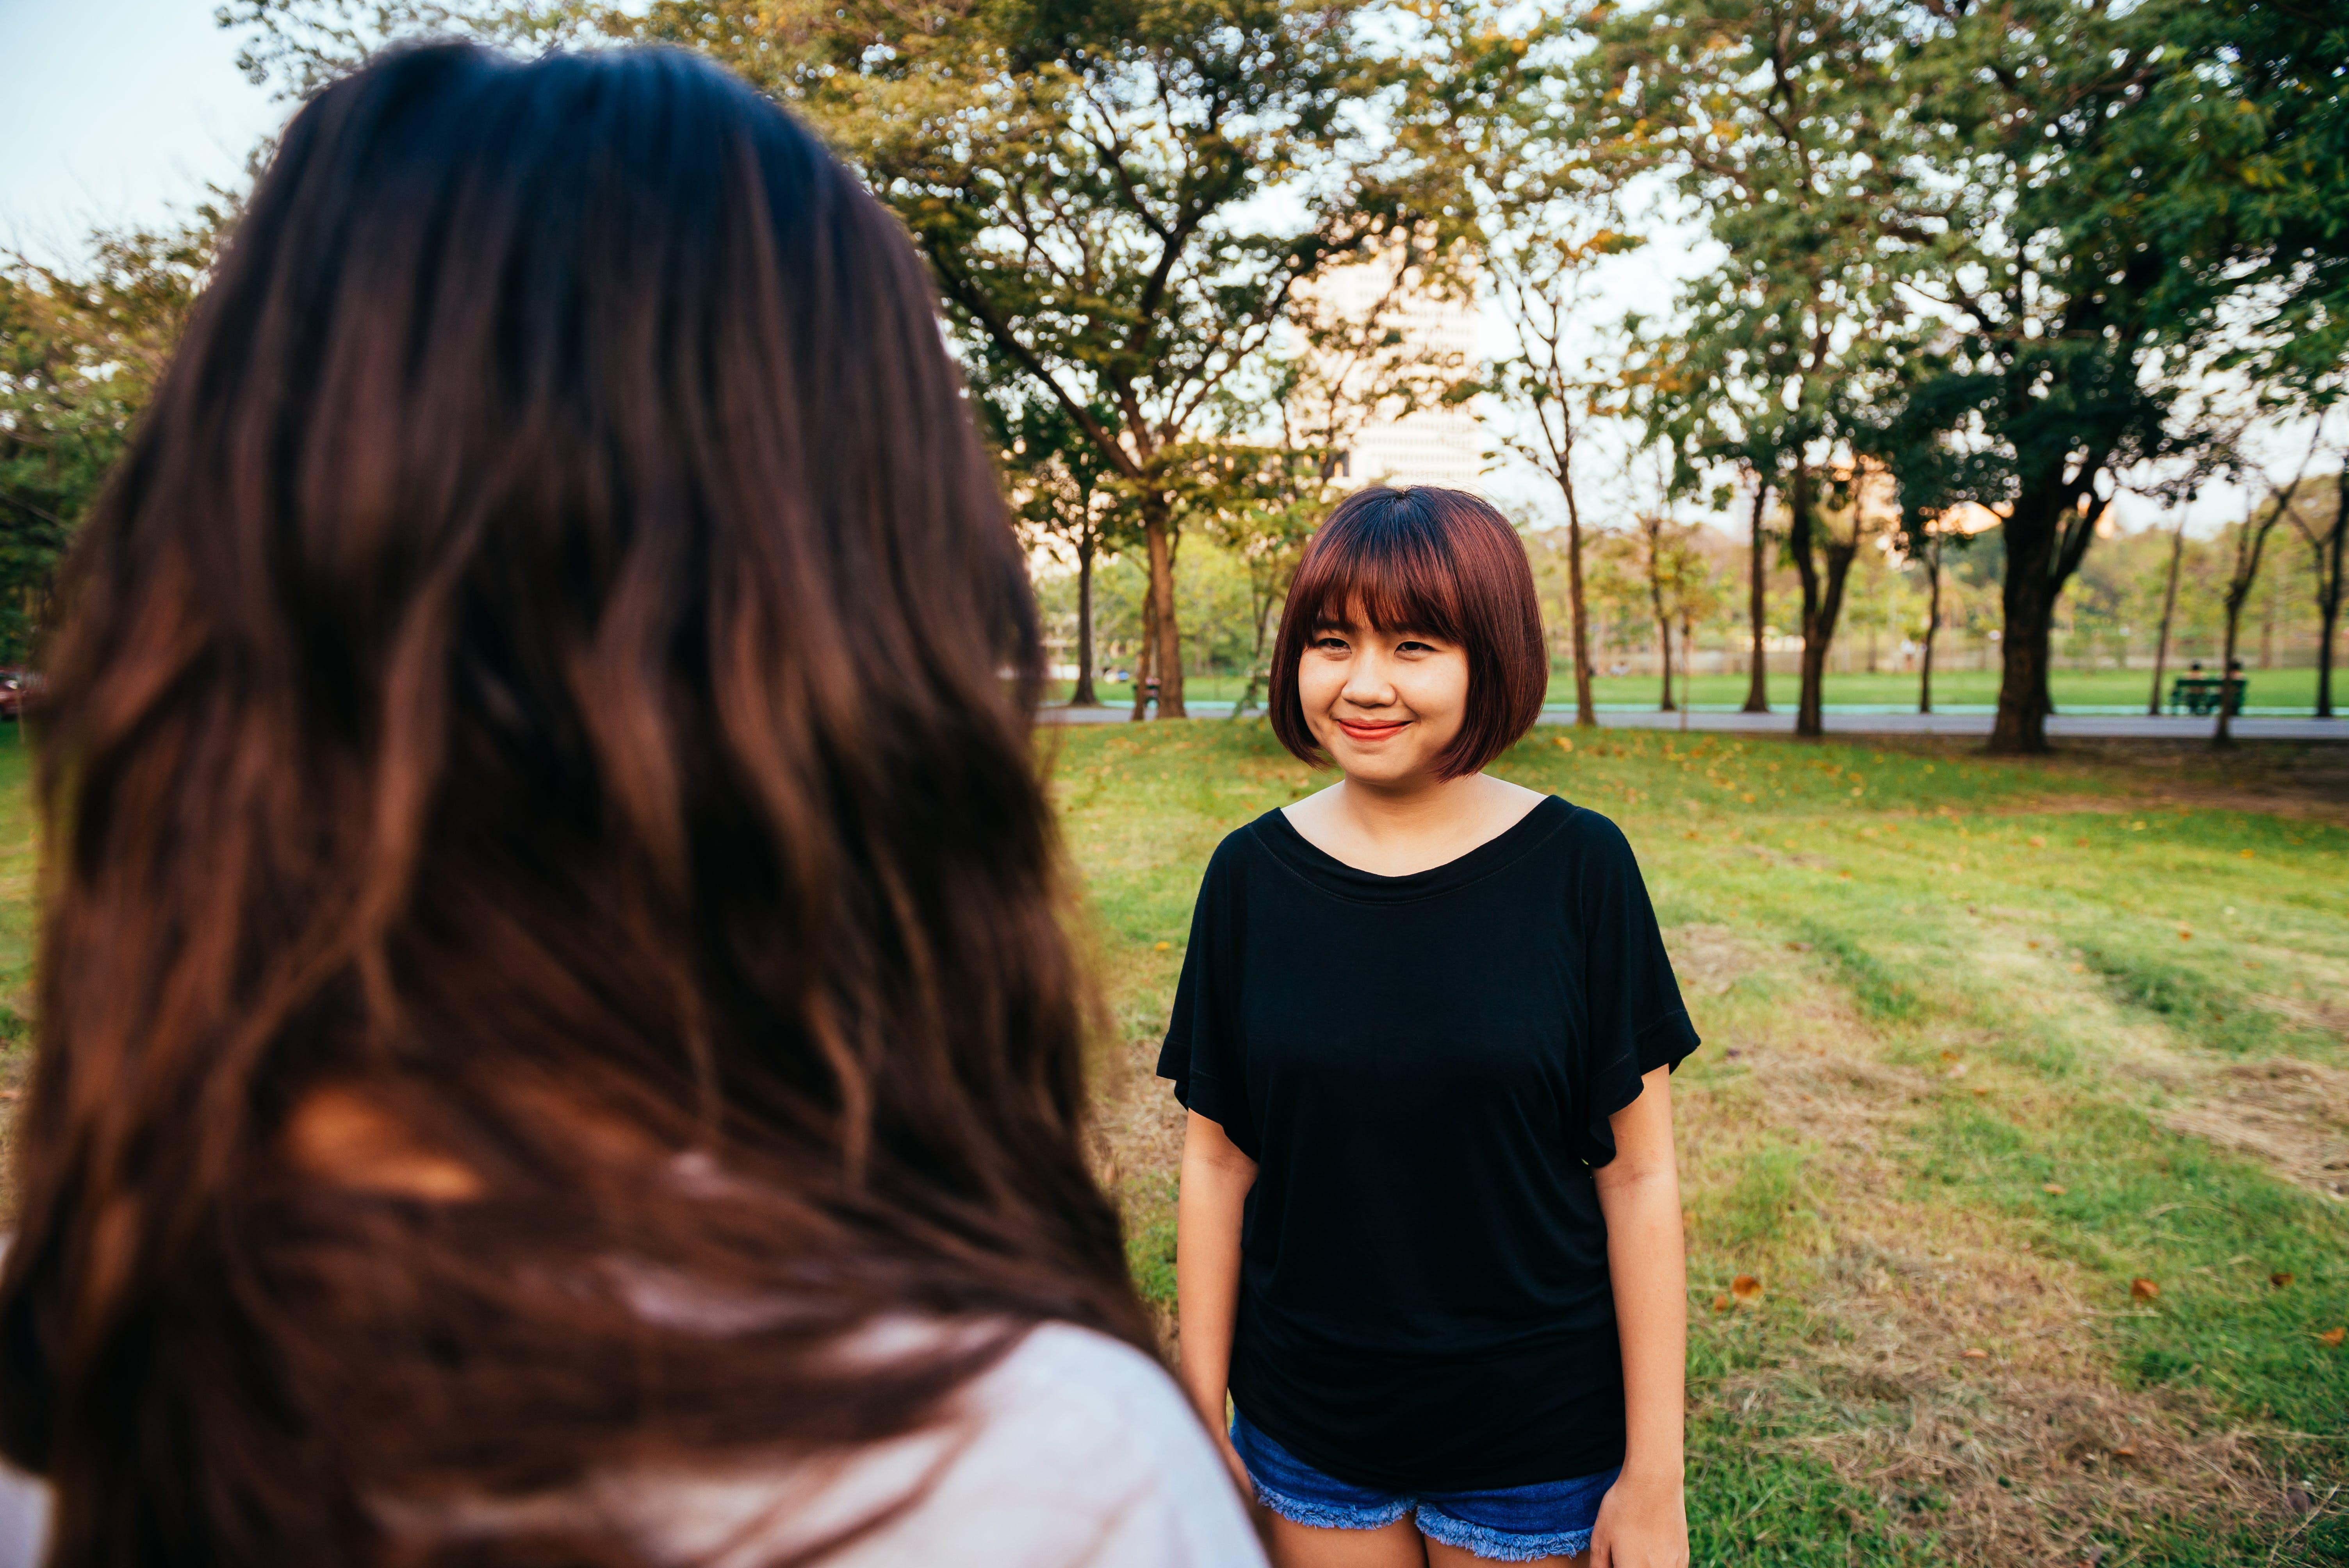 Woman Wearing Black Boat-neck Shirt on Green Grass